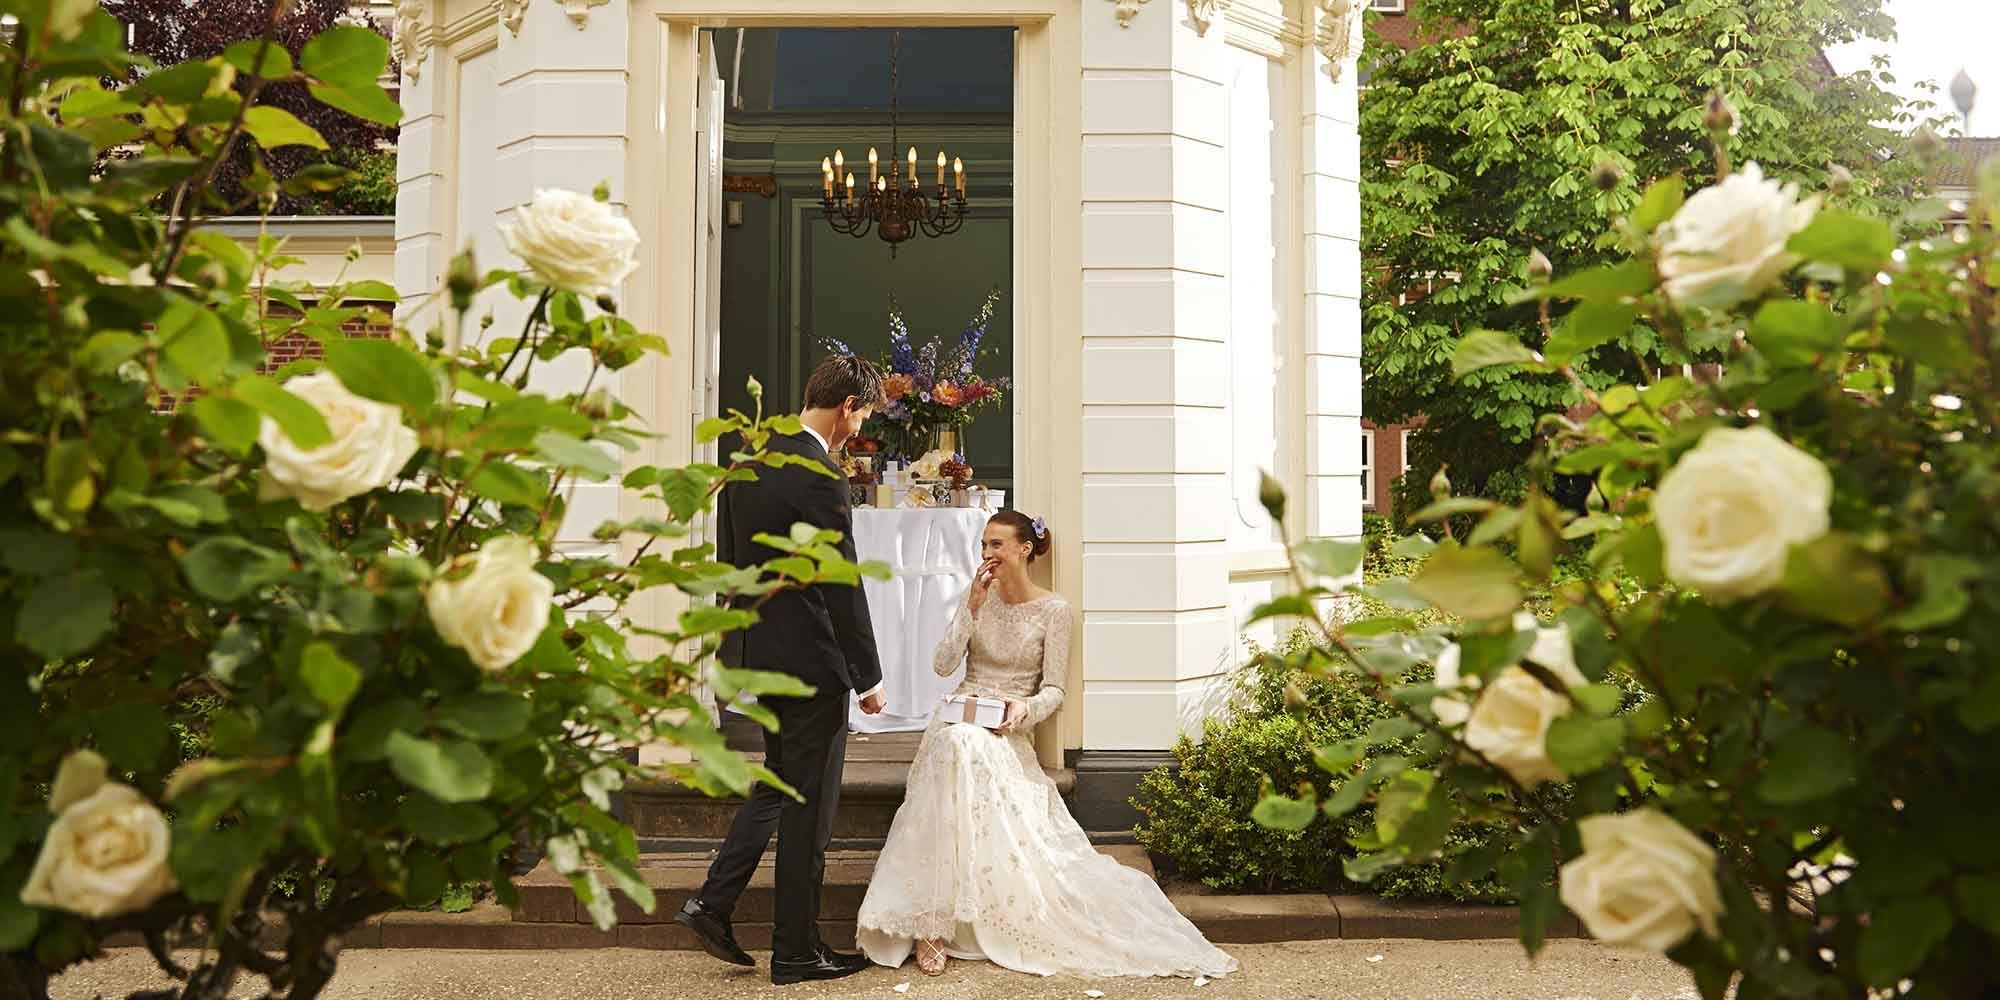 trouwen waldorf amsterdam, trouwlocatie waldorf amsterdam, trouwlocatie, trouwlocaties amsterdam, trouwen amsterdam, trouwen waldorf astoria, trouwen waldorf,